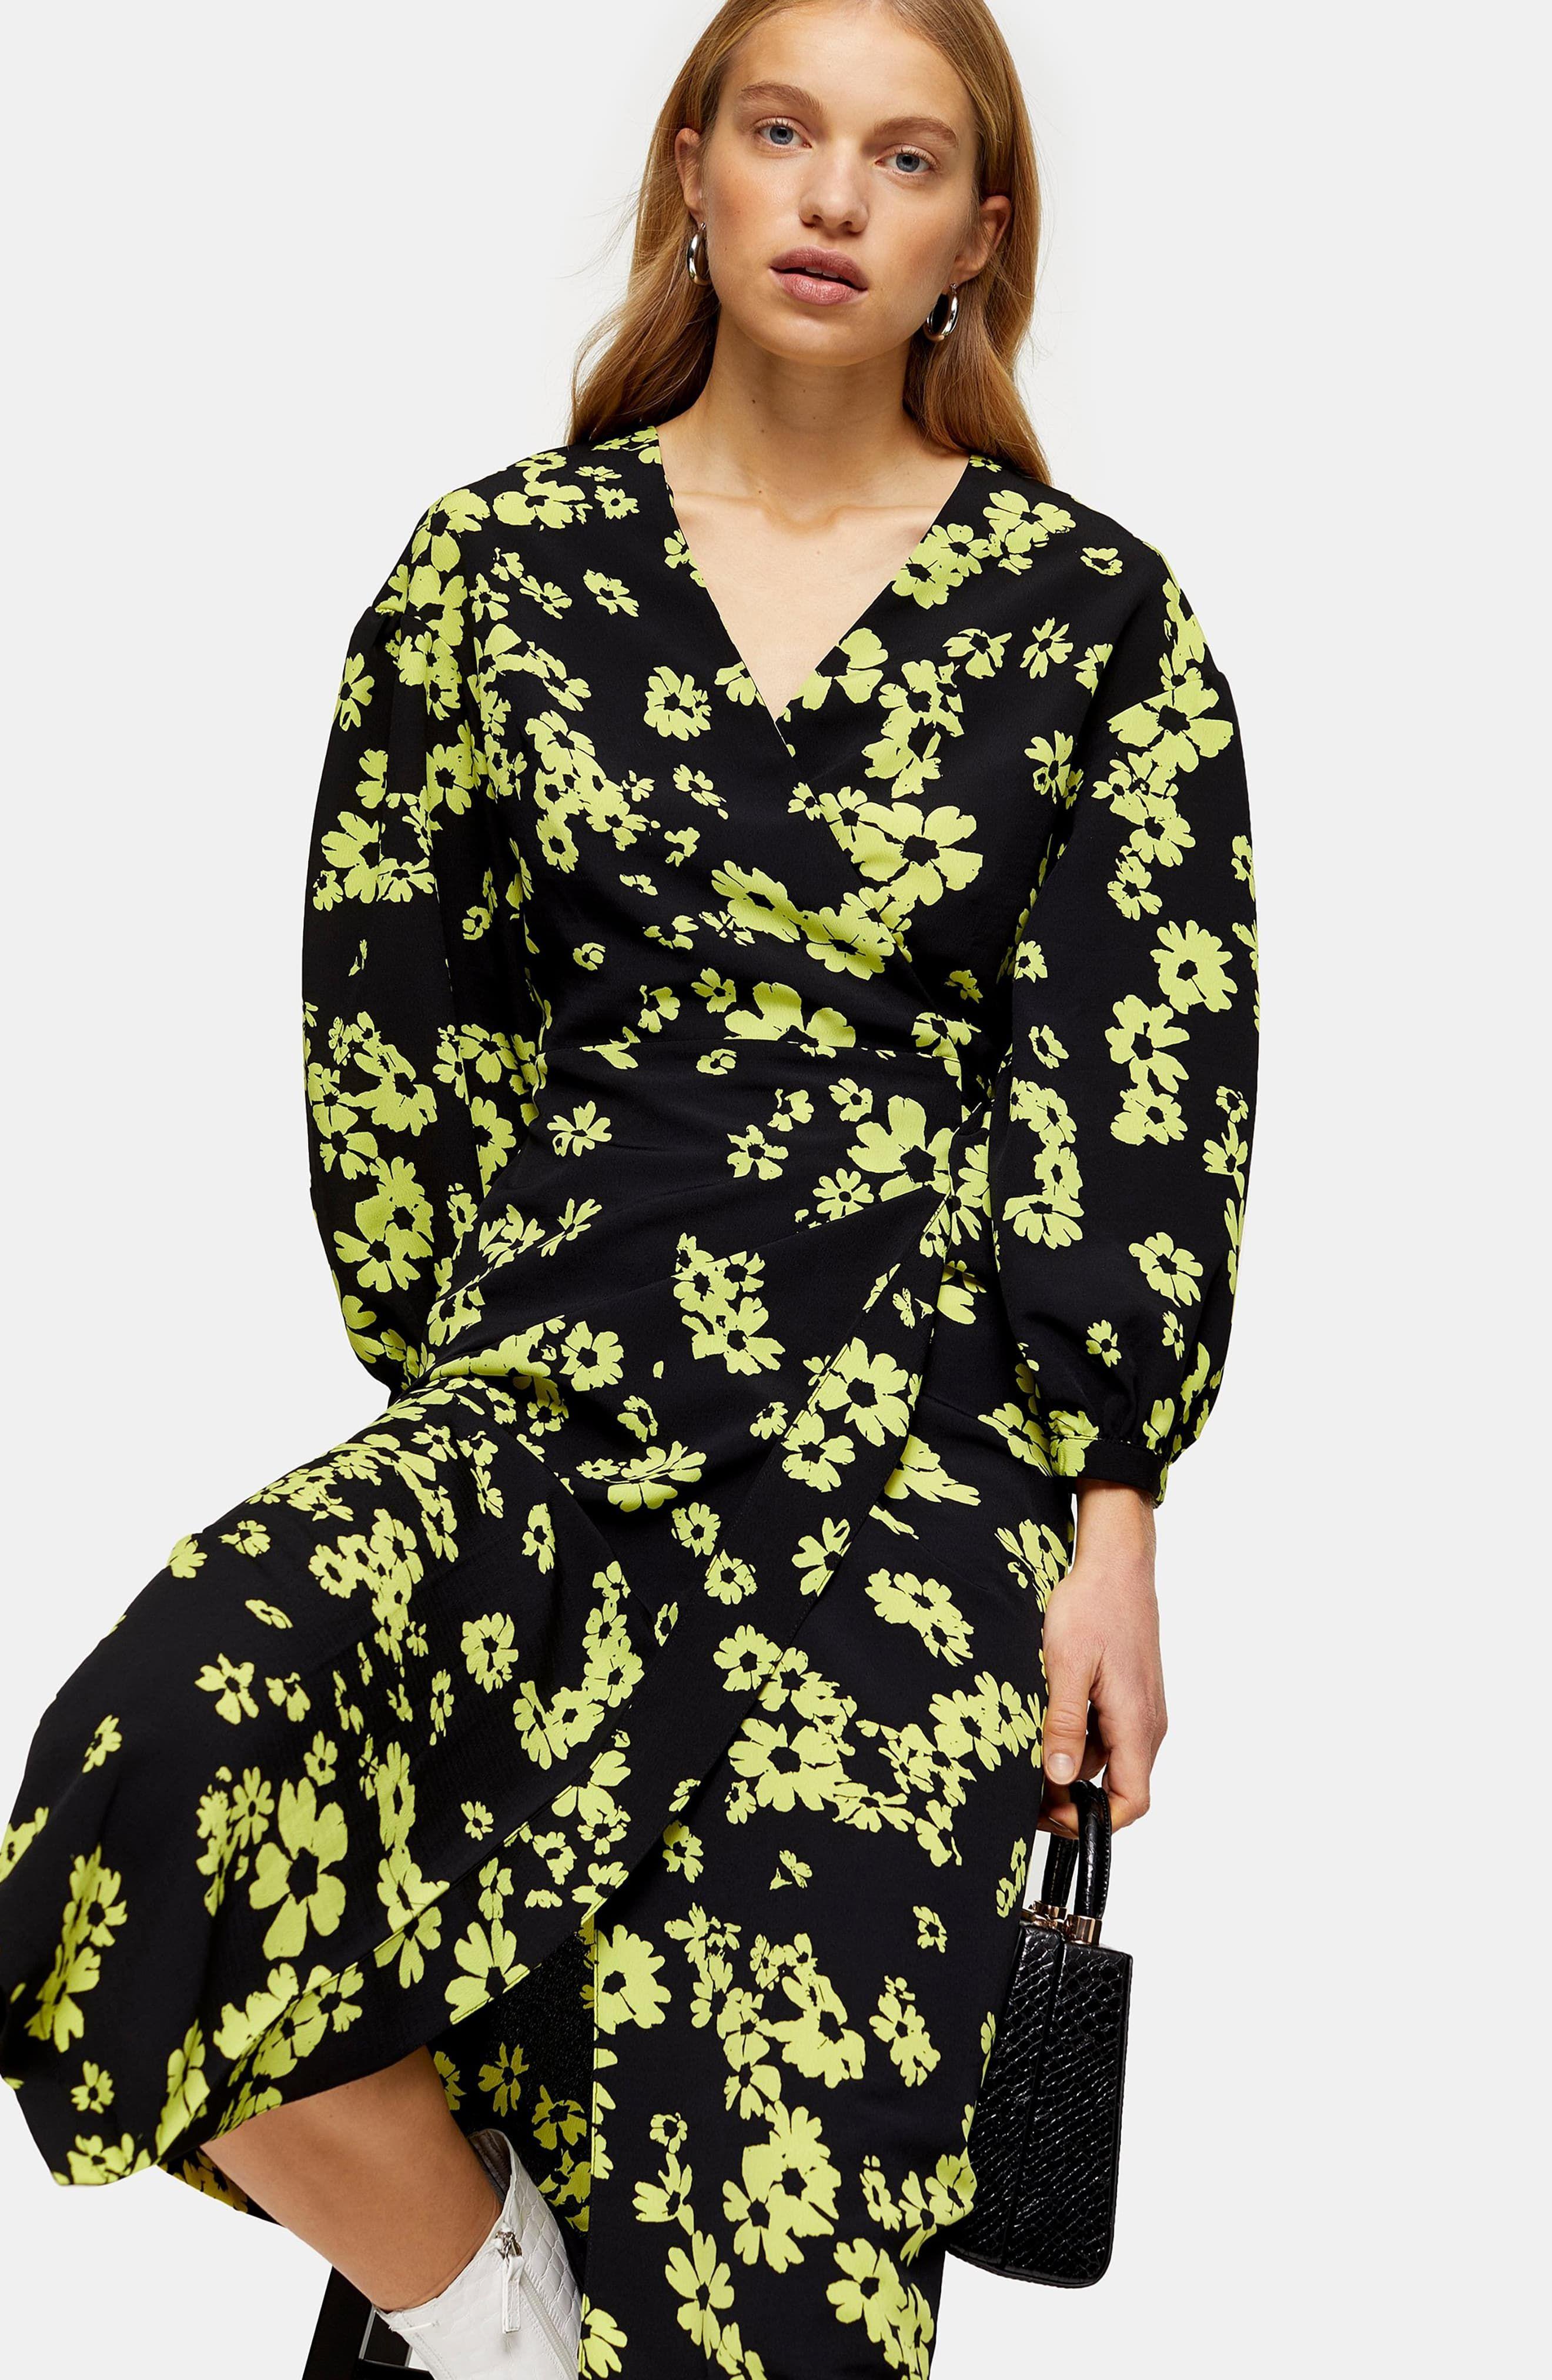 Women S Topshop Daisy Drama Wrap Midi Dress Size 12 Us Fits Like 14 Black In 2020 Long Sleeve Wrap Midi Dress Top Shop Dress Nordstrom Dresses [ 4048 x 2640 Pixel ]